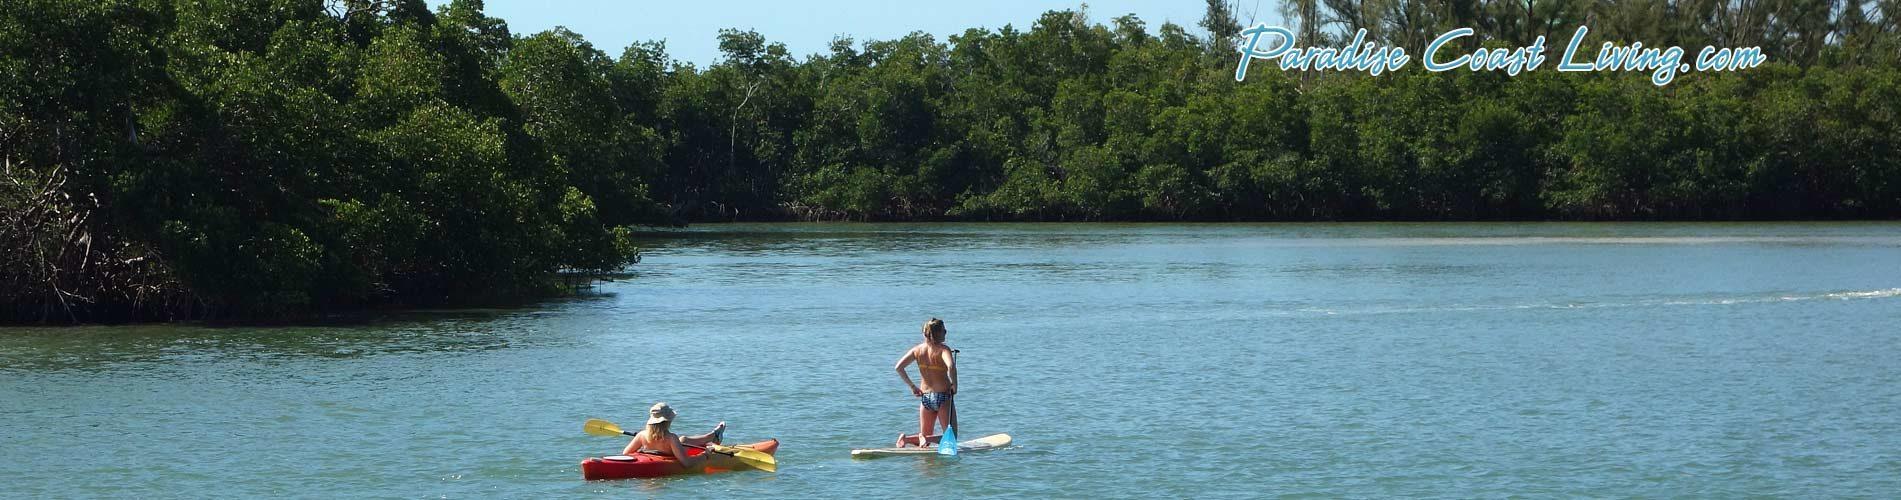 Visit SWFL Paradise Coast Estero Naples Marco Island Fort Myers Florida